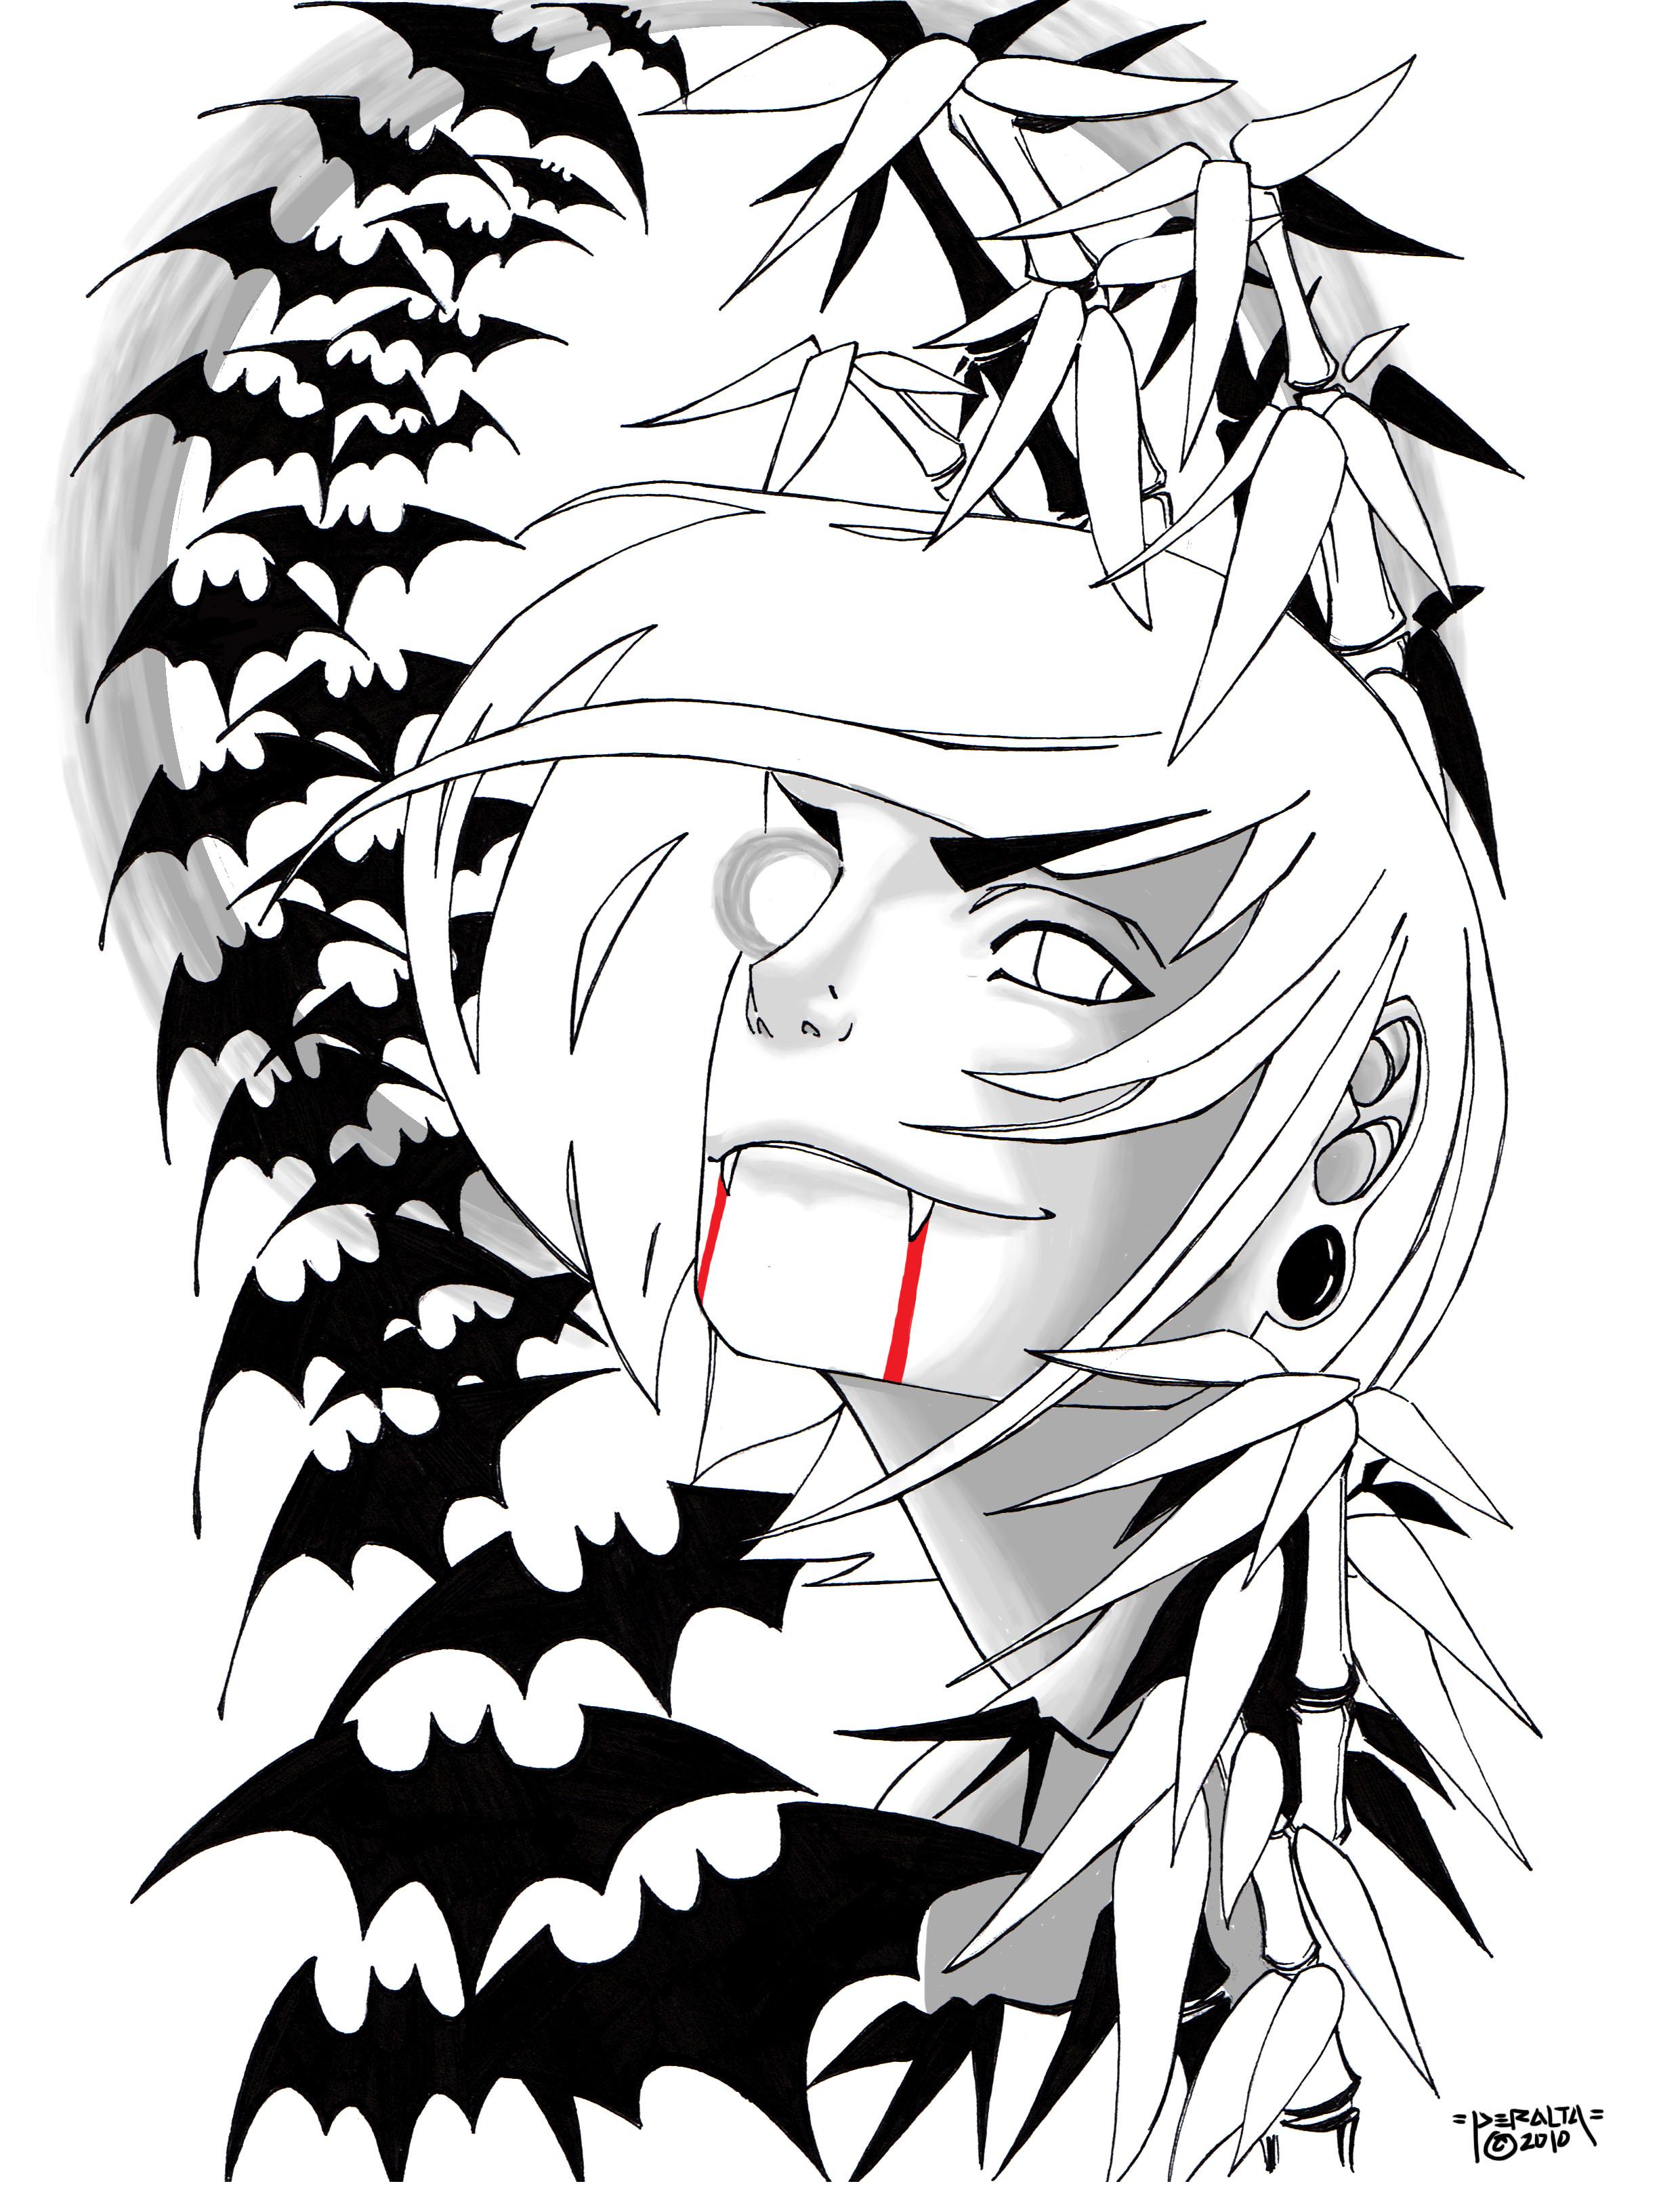 2480x3229 Vampire Half Sleeve Tatt By Hashbrown Tm